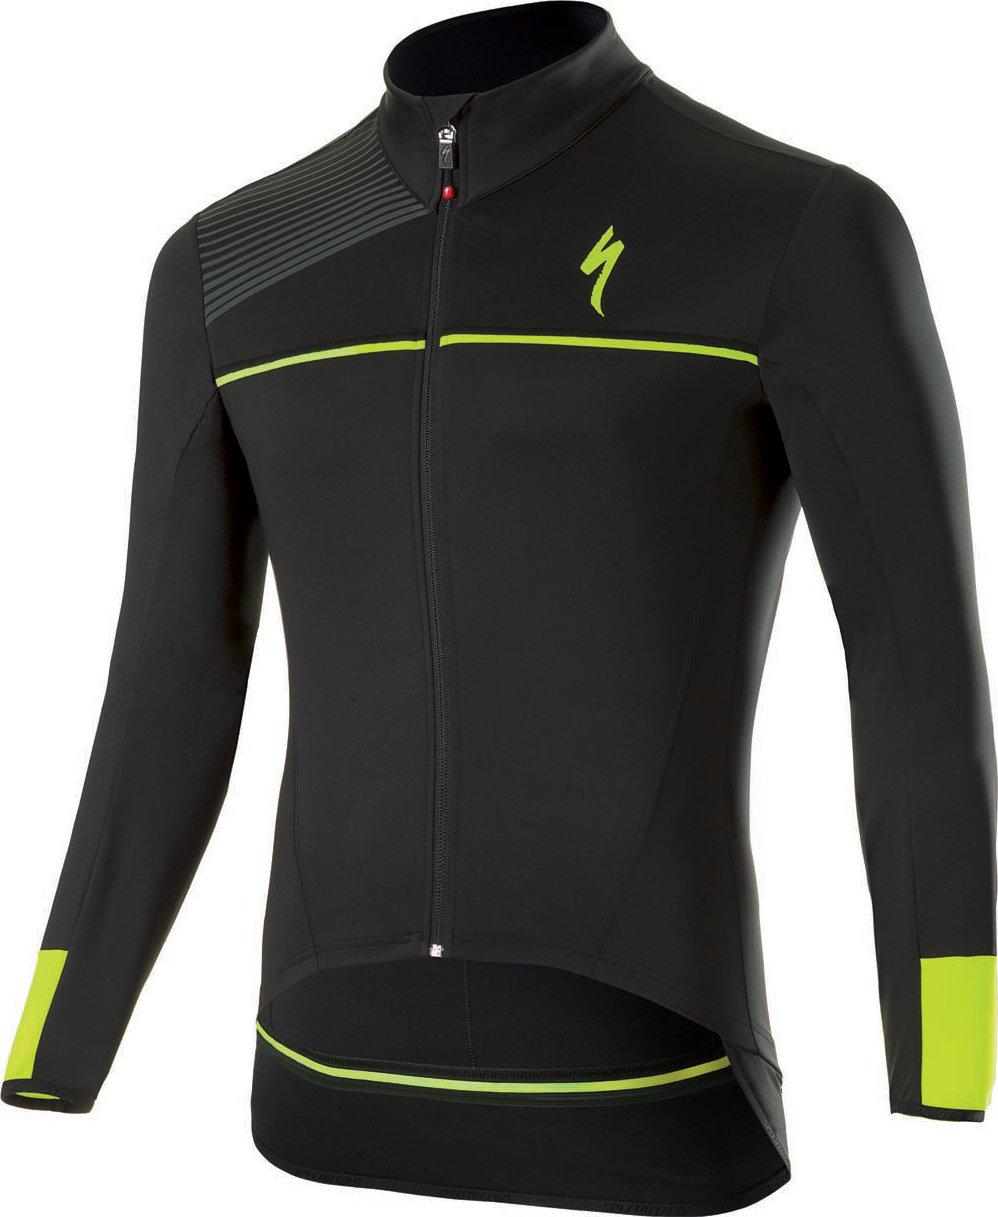 Specialized Element SL Elite WR jersey LS Black/Neon Yellow XL - Alpha Bikes